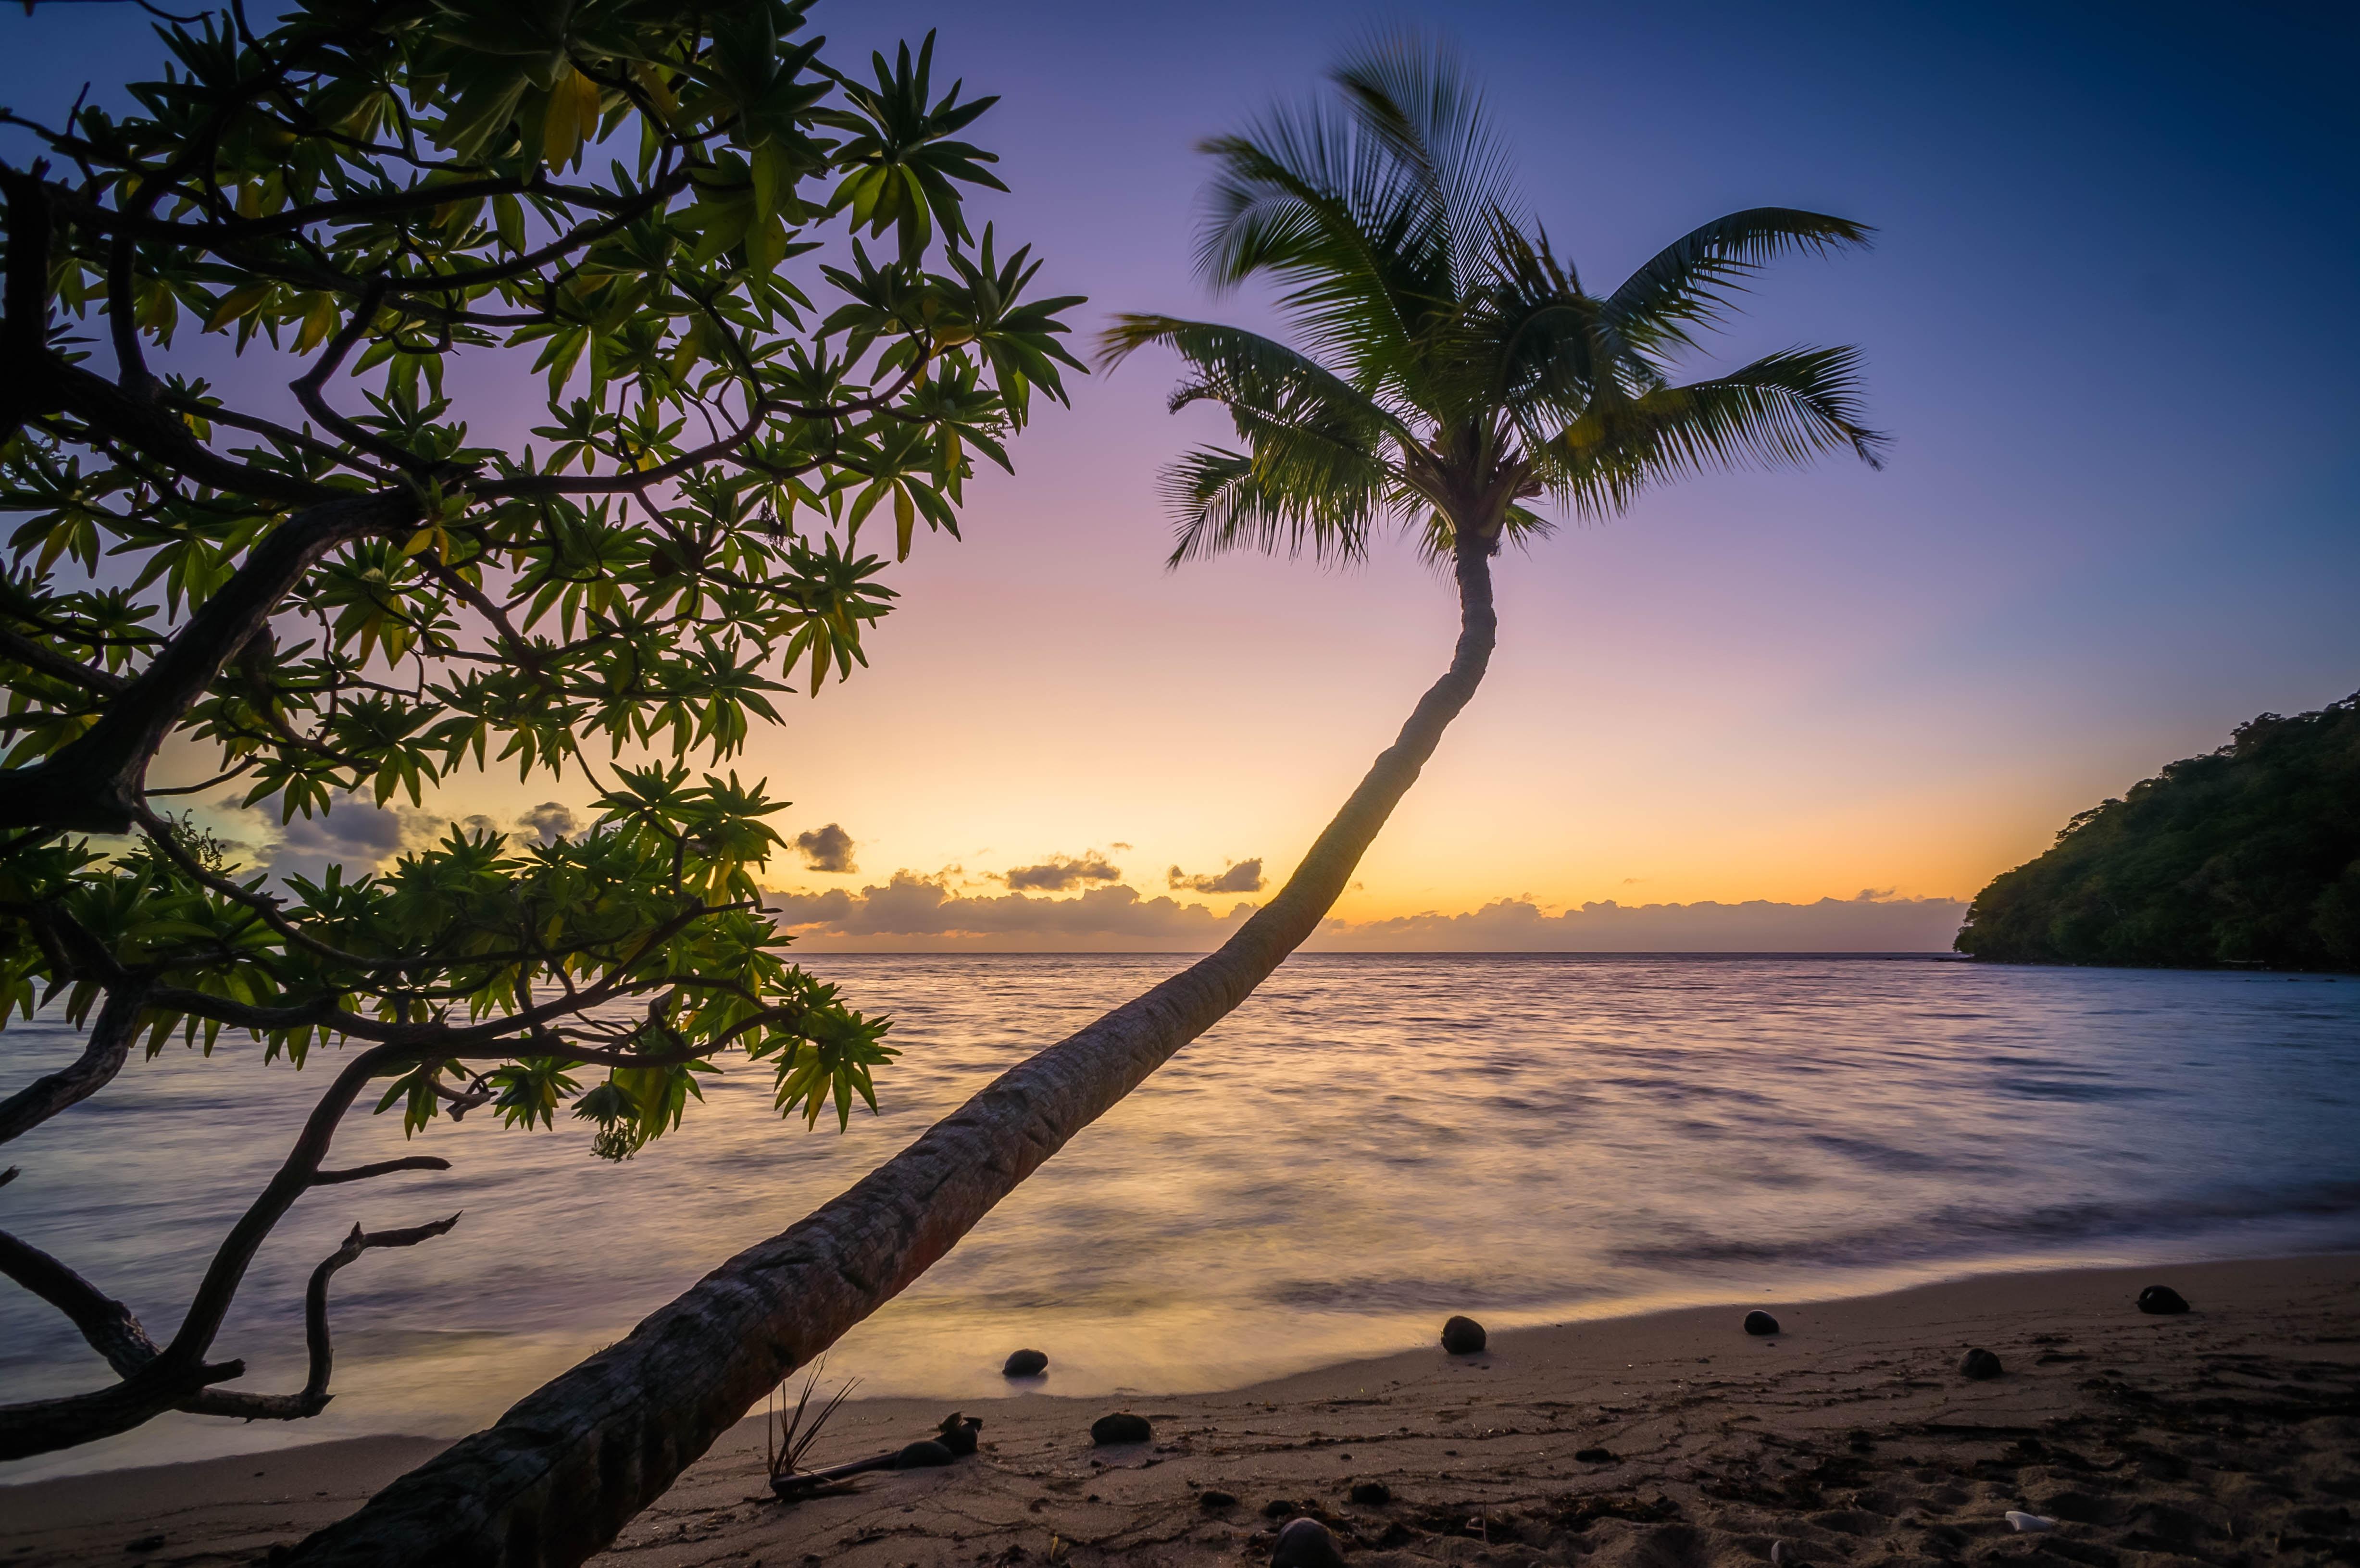 Inseln zum Träumen - Beliebte Trauminseln & Geheimtipps